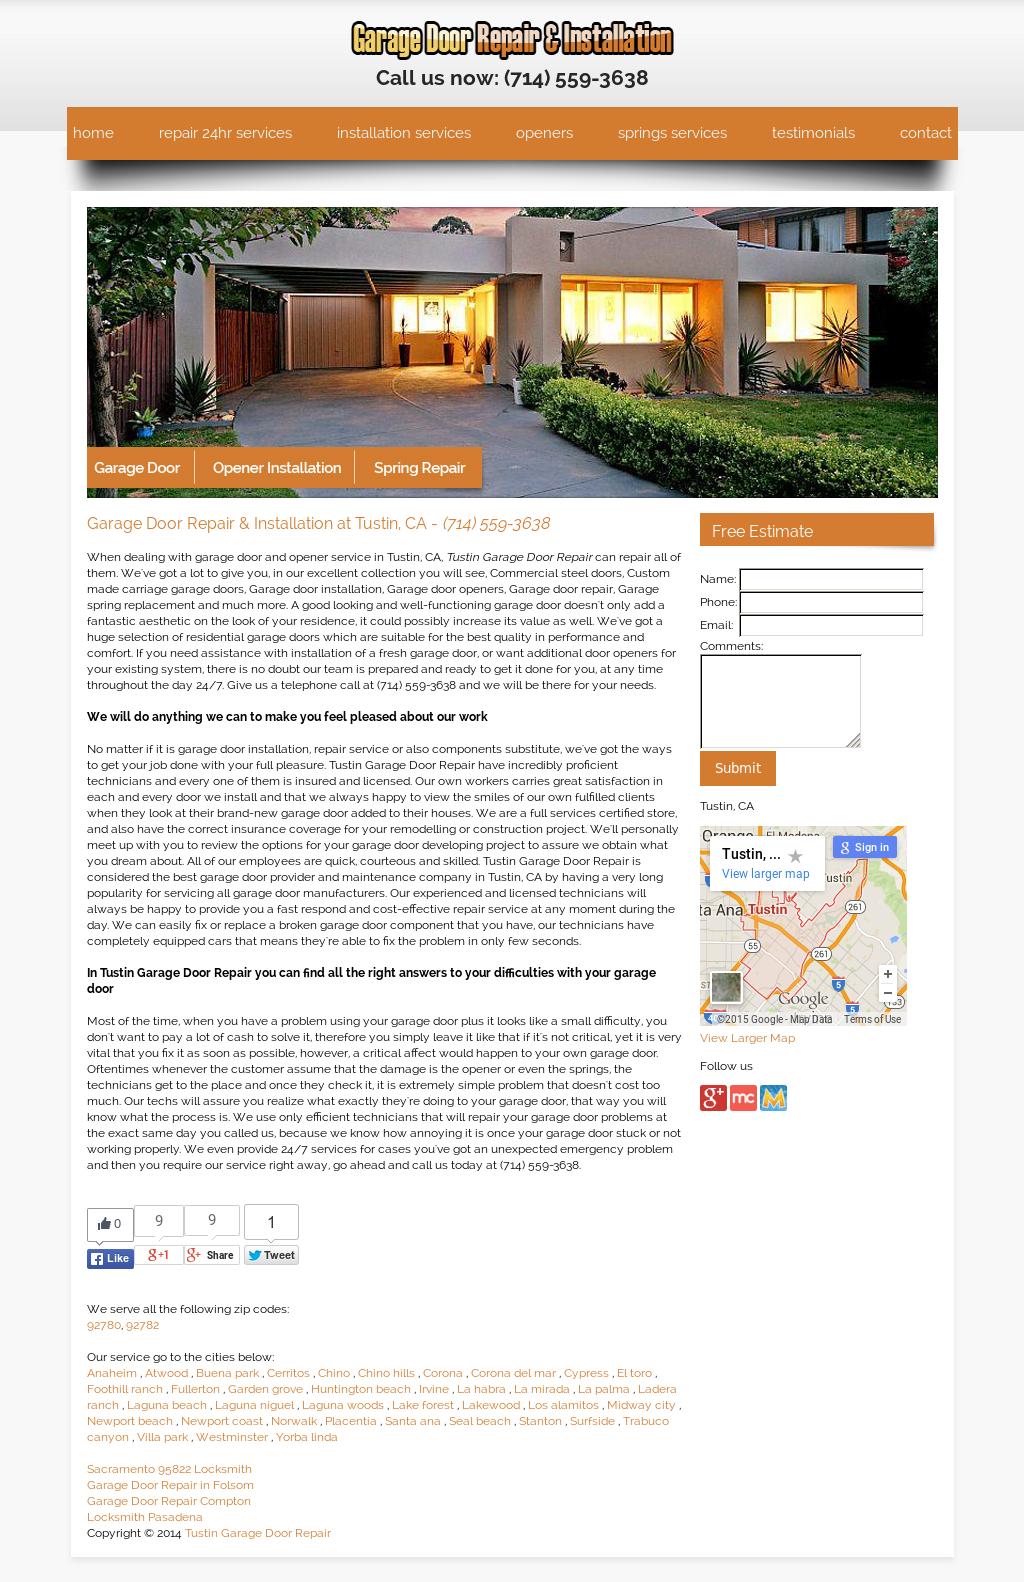 Tustin Garage Door Repair Competitors Revenue And Employees Owler